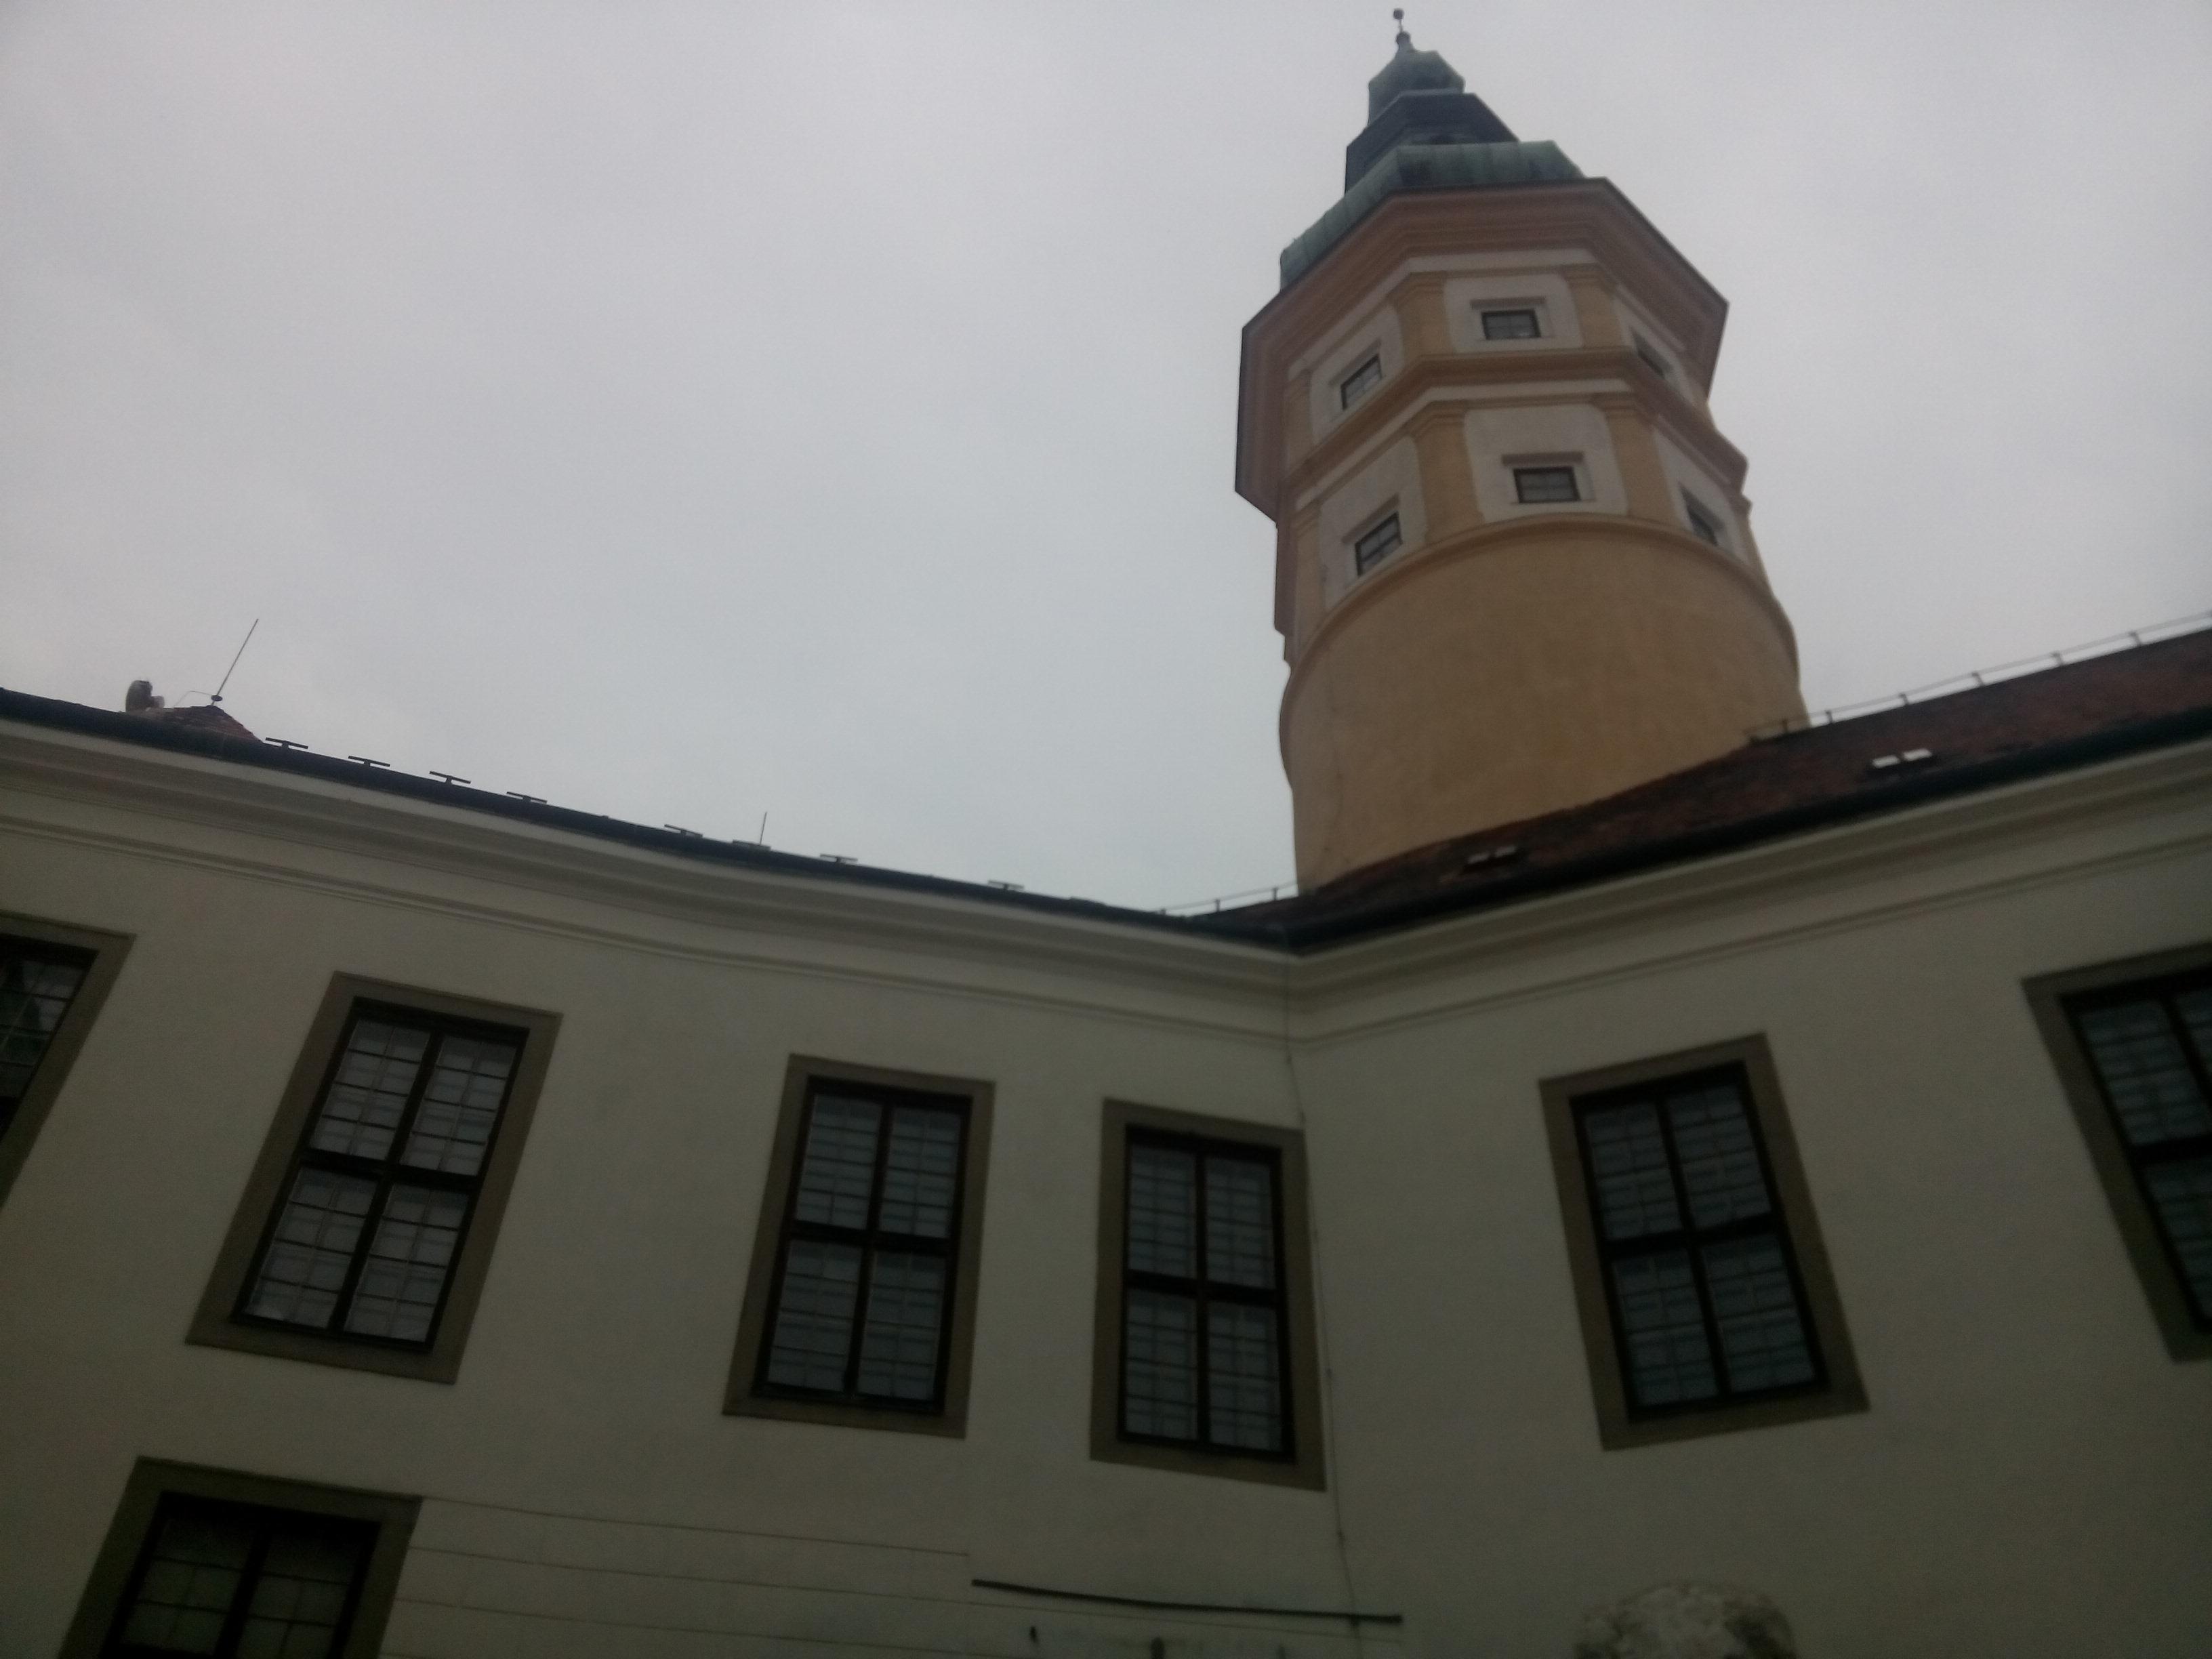 https://i.amy.gy/201804-slovakia-austria-czech/IMG_20180416_150854.jpg